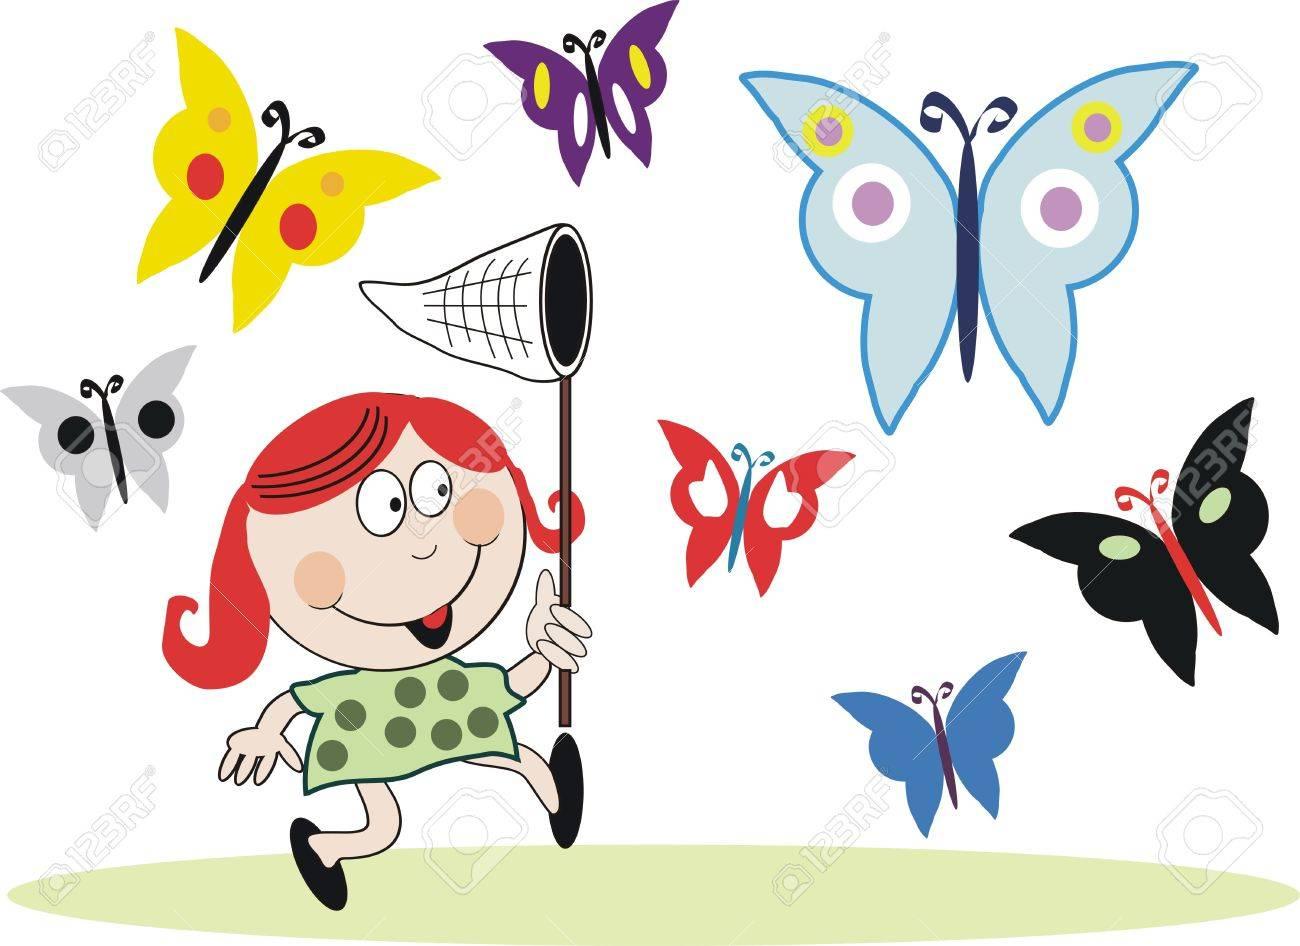 chasing butterflies cartoon royalty free cliparts vectors